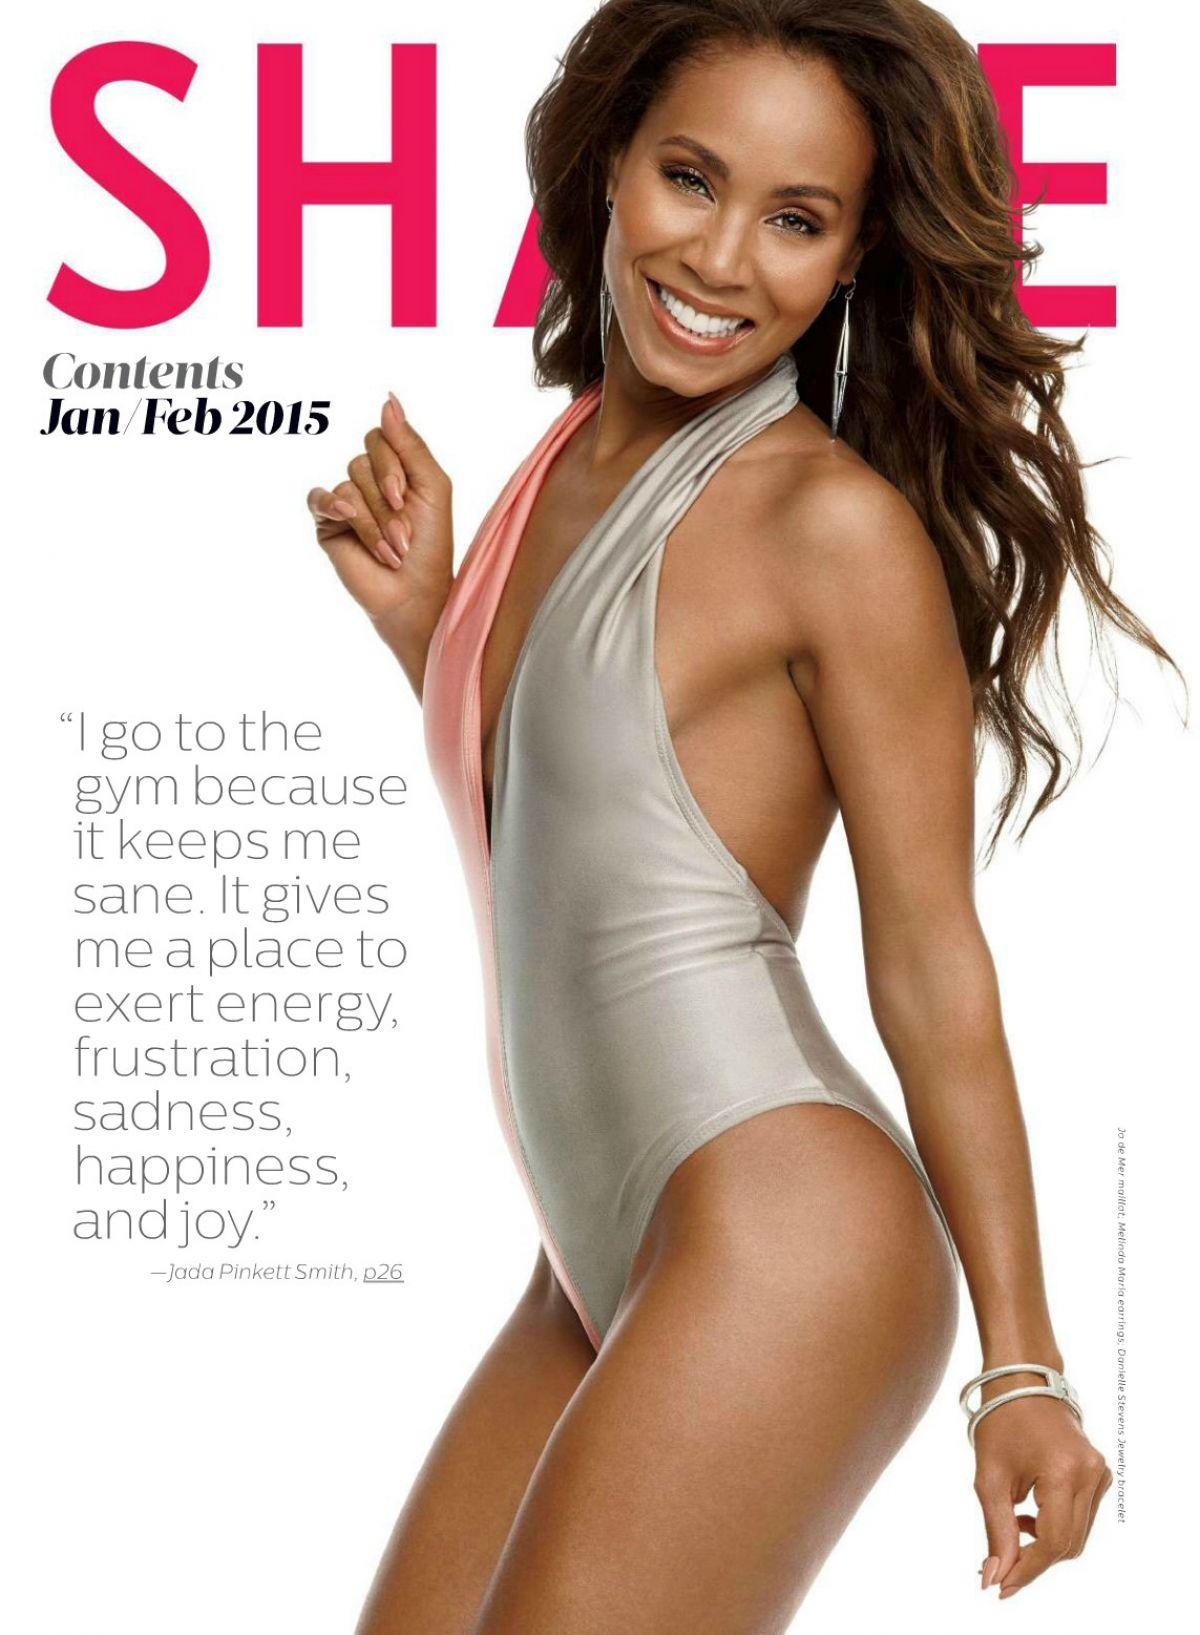 Idea jada pinkett smith magazine thanks how